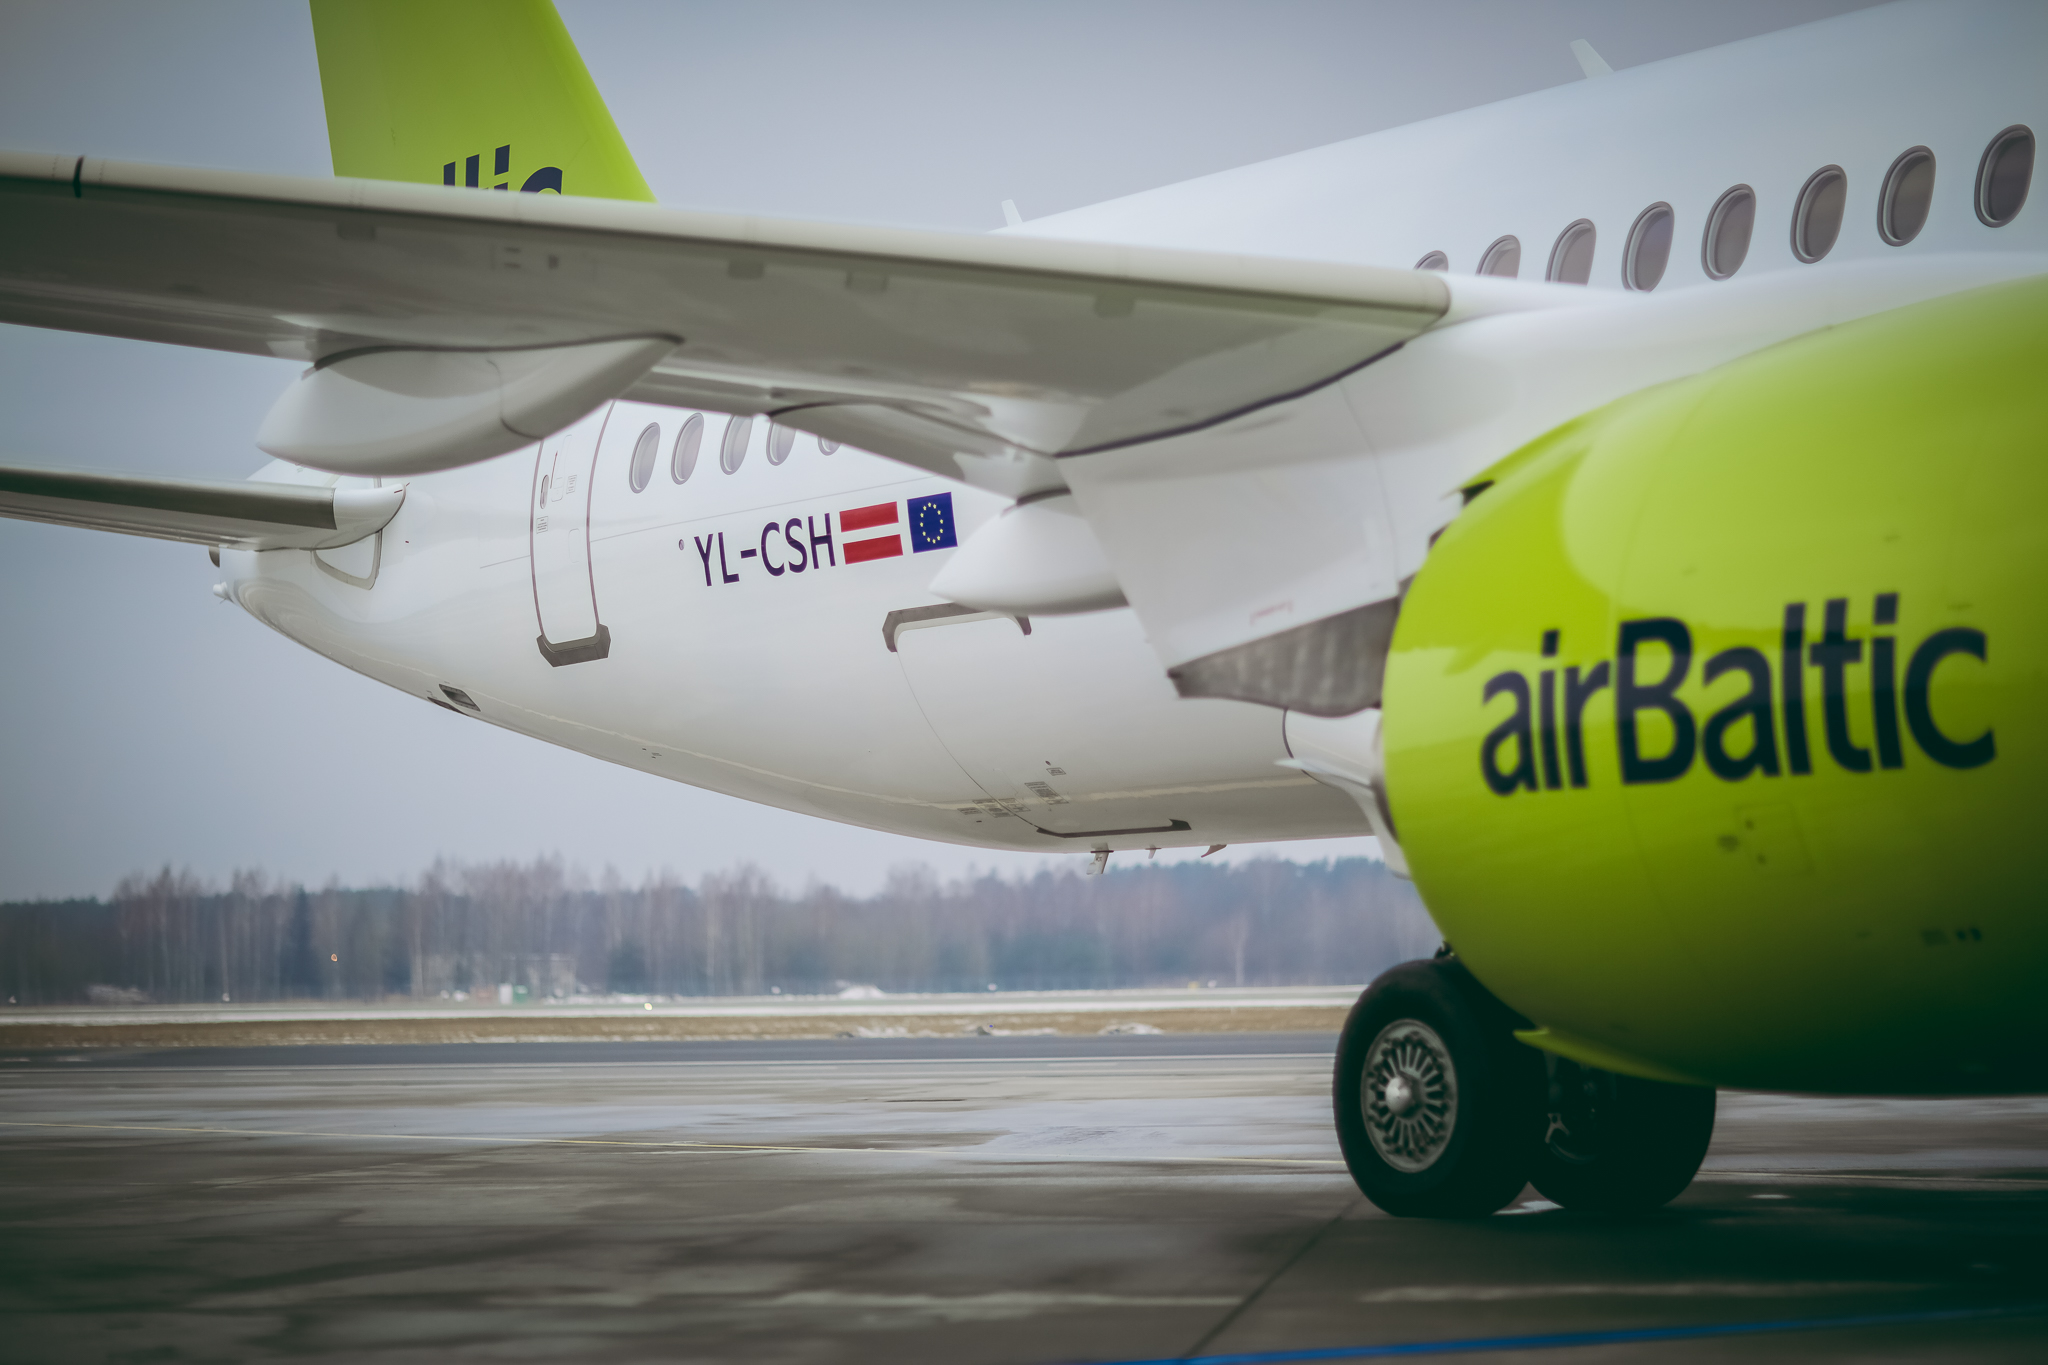 airBaltic har fået sin første CS300 i 2018. Foto: airBaltic.